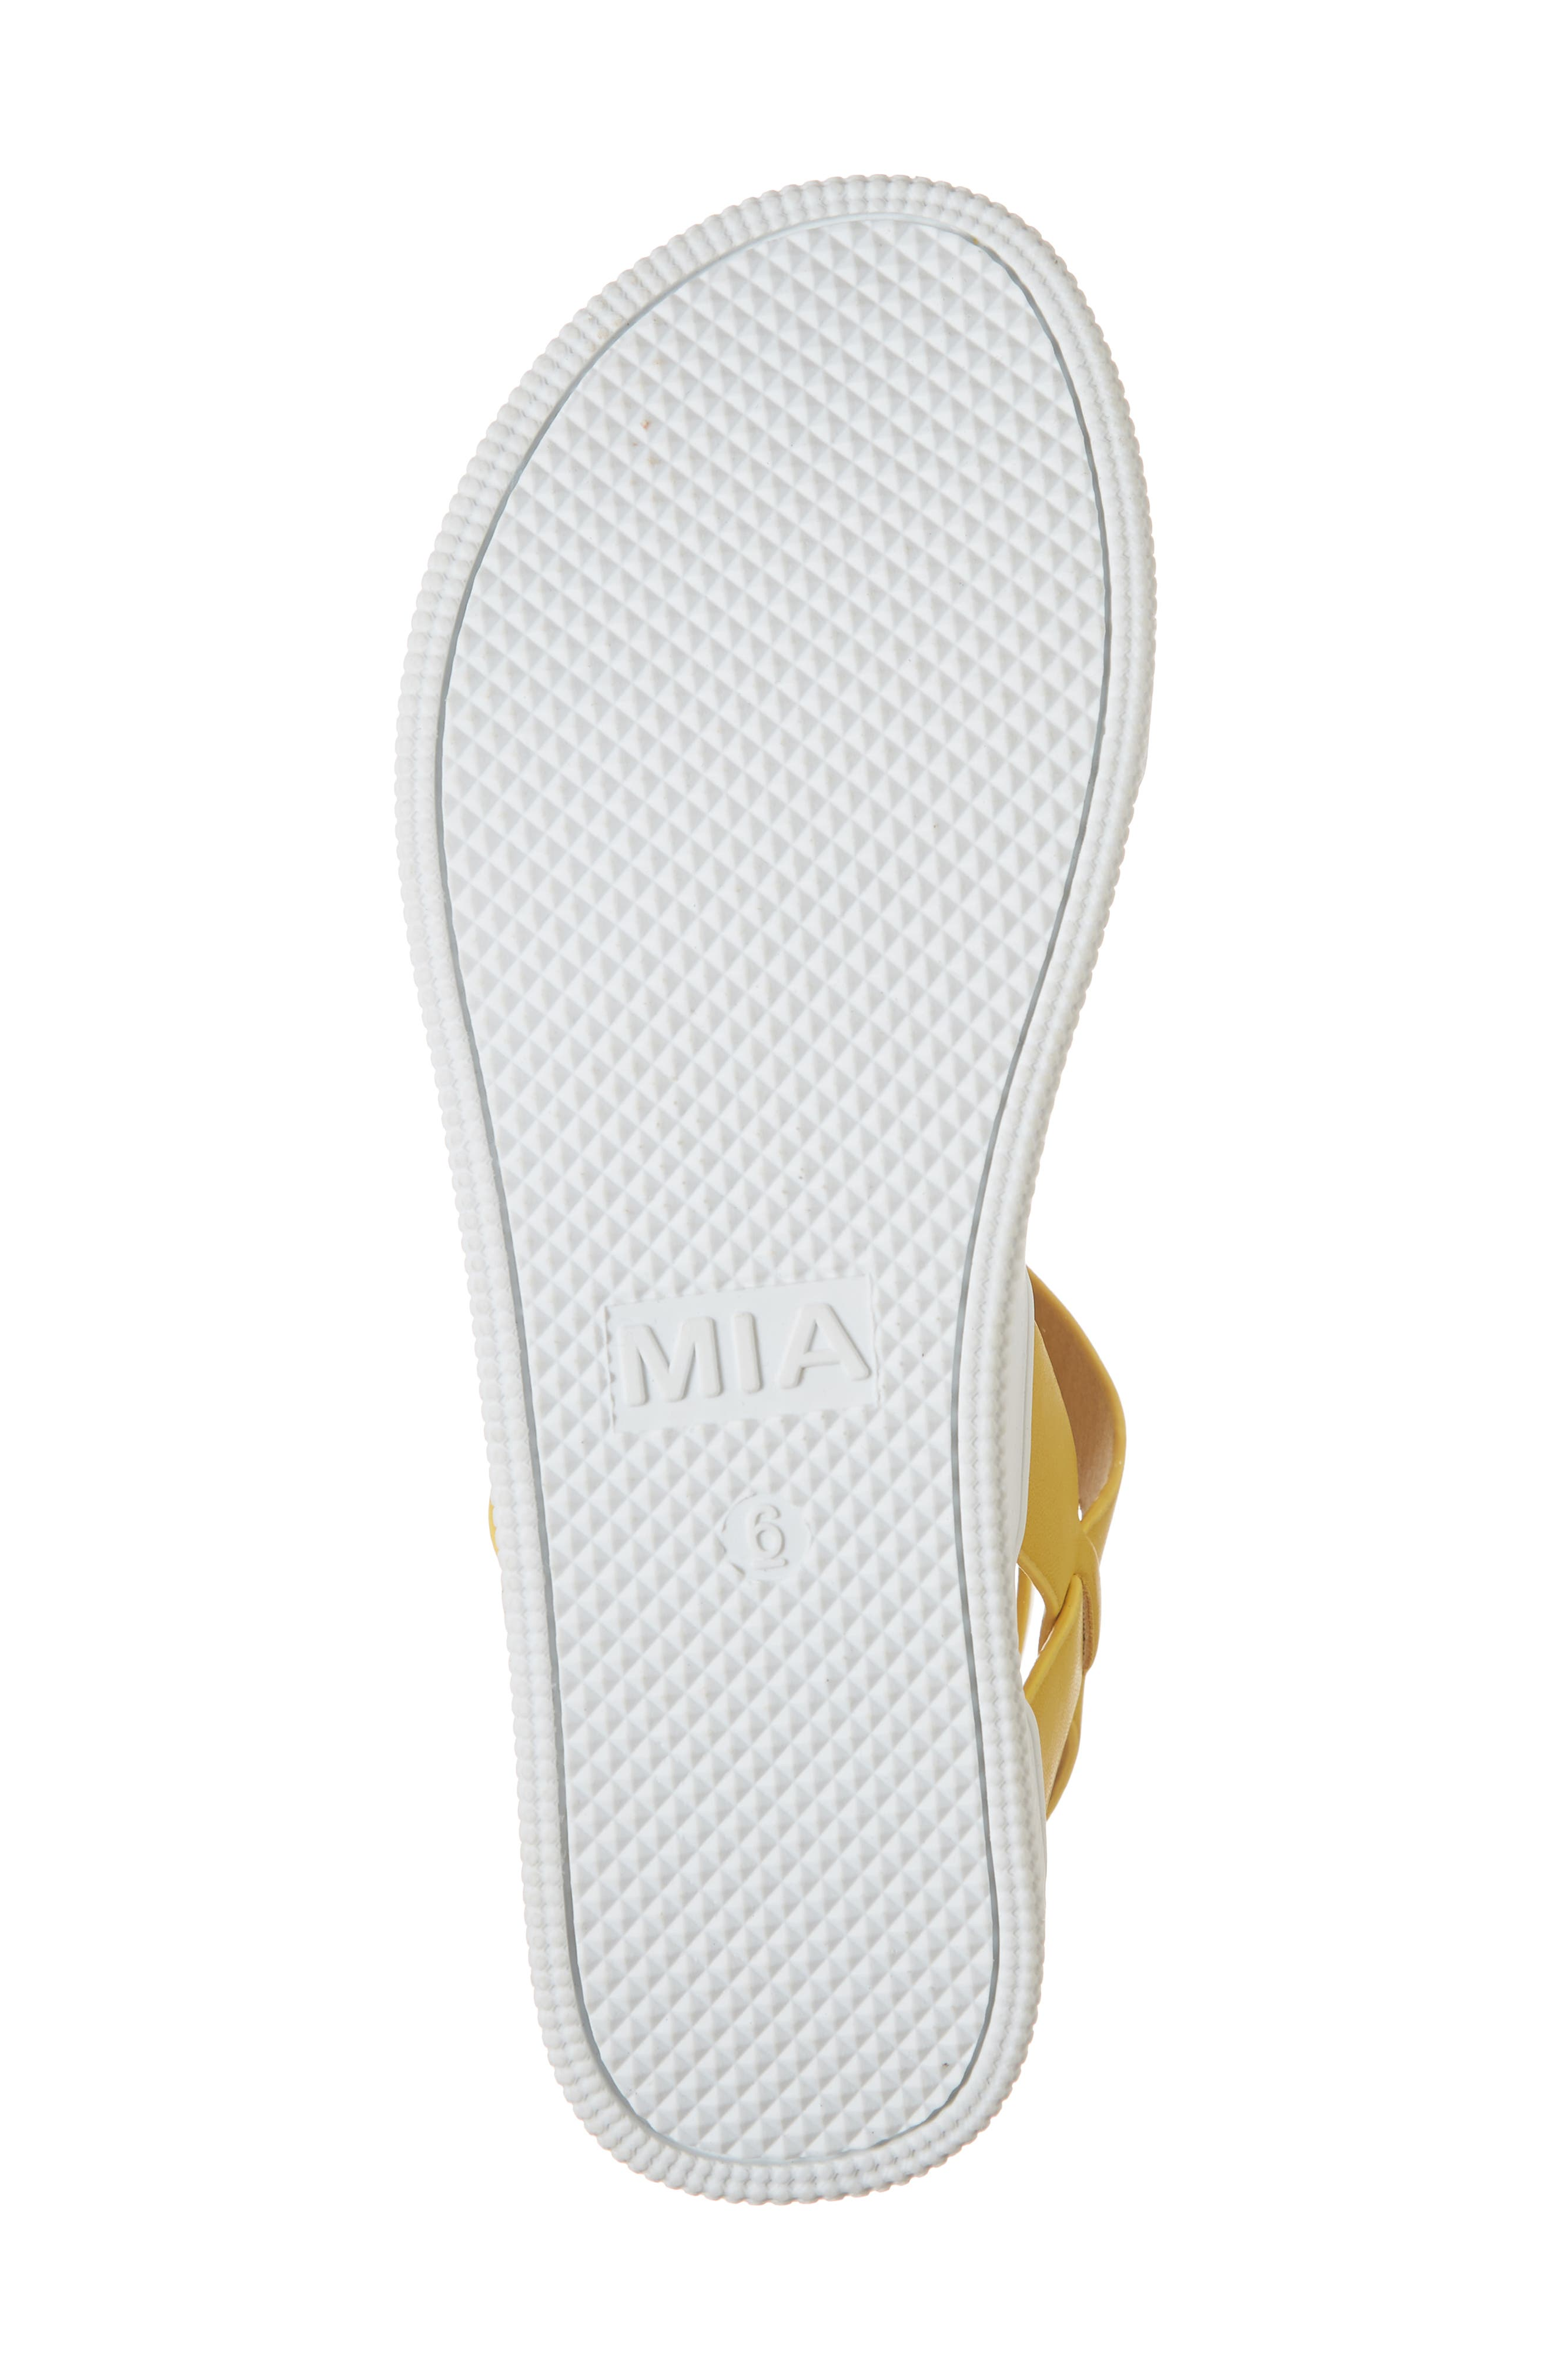 Calla Platform Sandal,                             Alternate thumbnail 6, color,                             YELLOW FAUX LEATHER